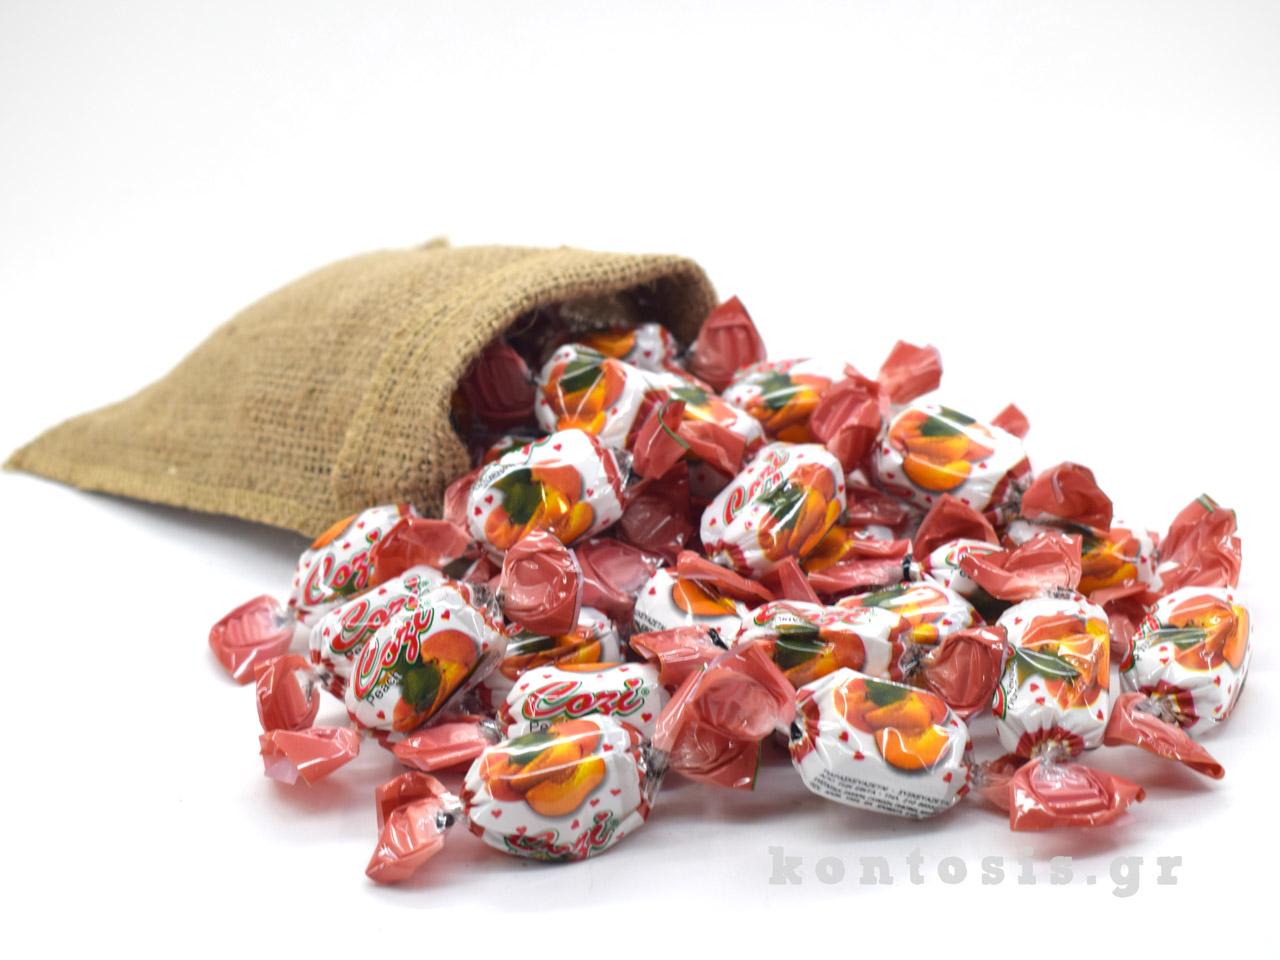 karameles soft zele gelo rodakino peach